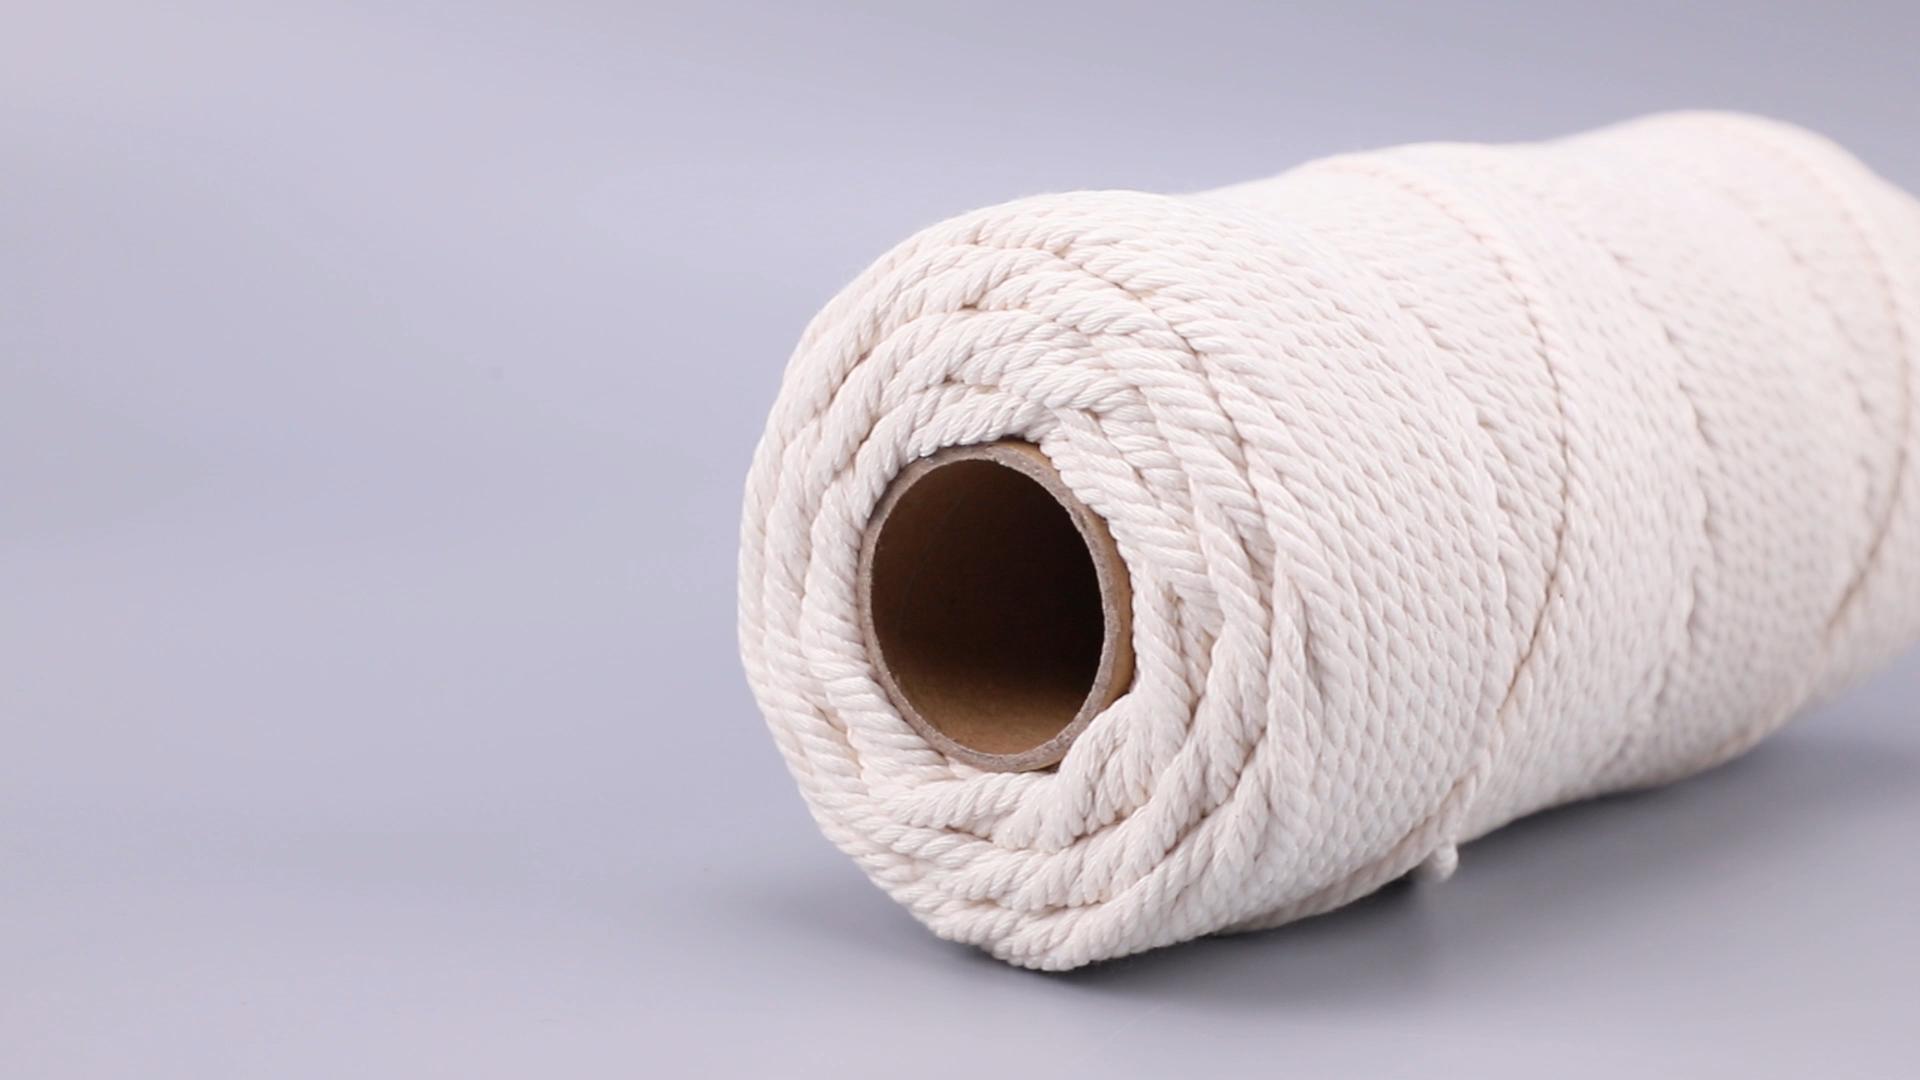 Bengku מקרמה טאסל גרלנד מקרמה צמיד חוט עם טבעי אבן מקרמה כבל 3 Mm